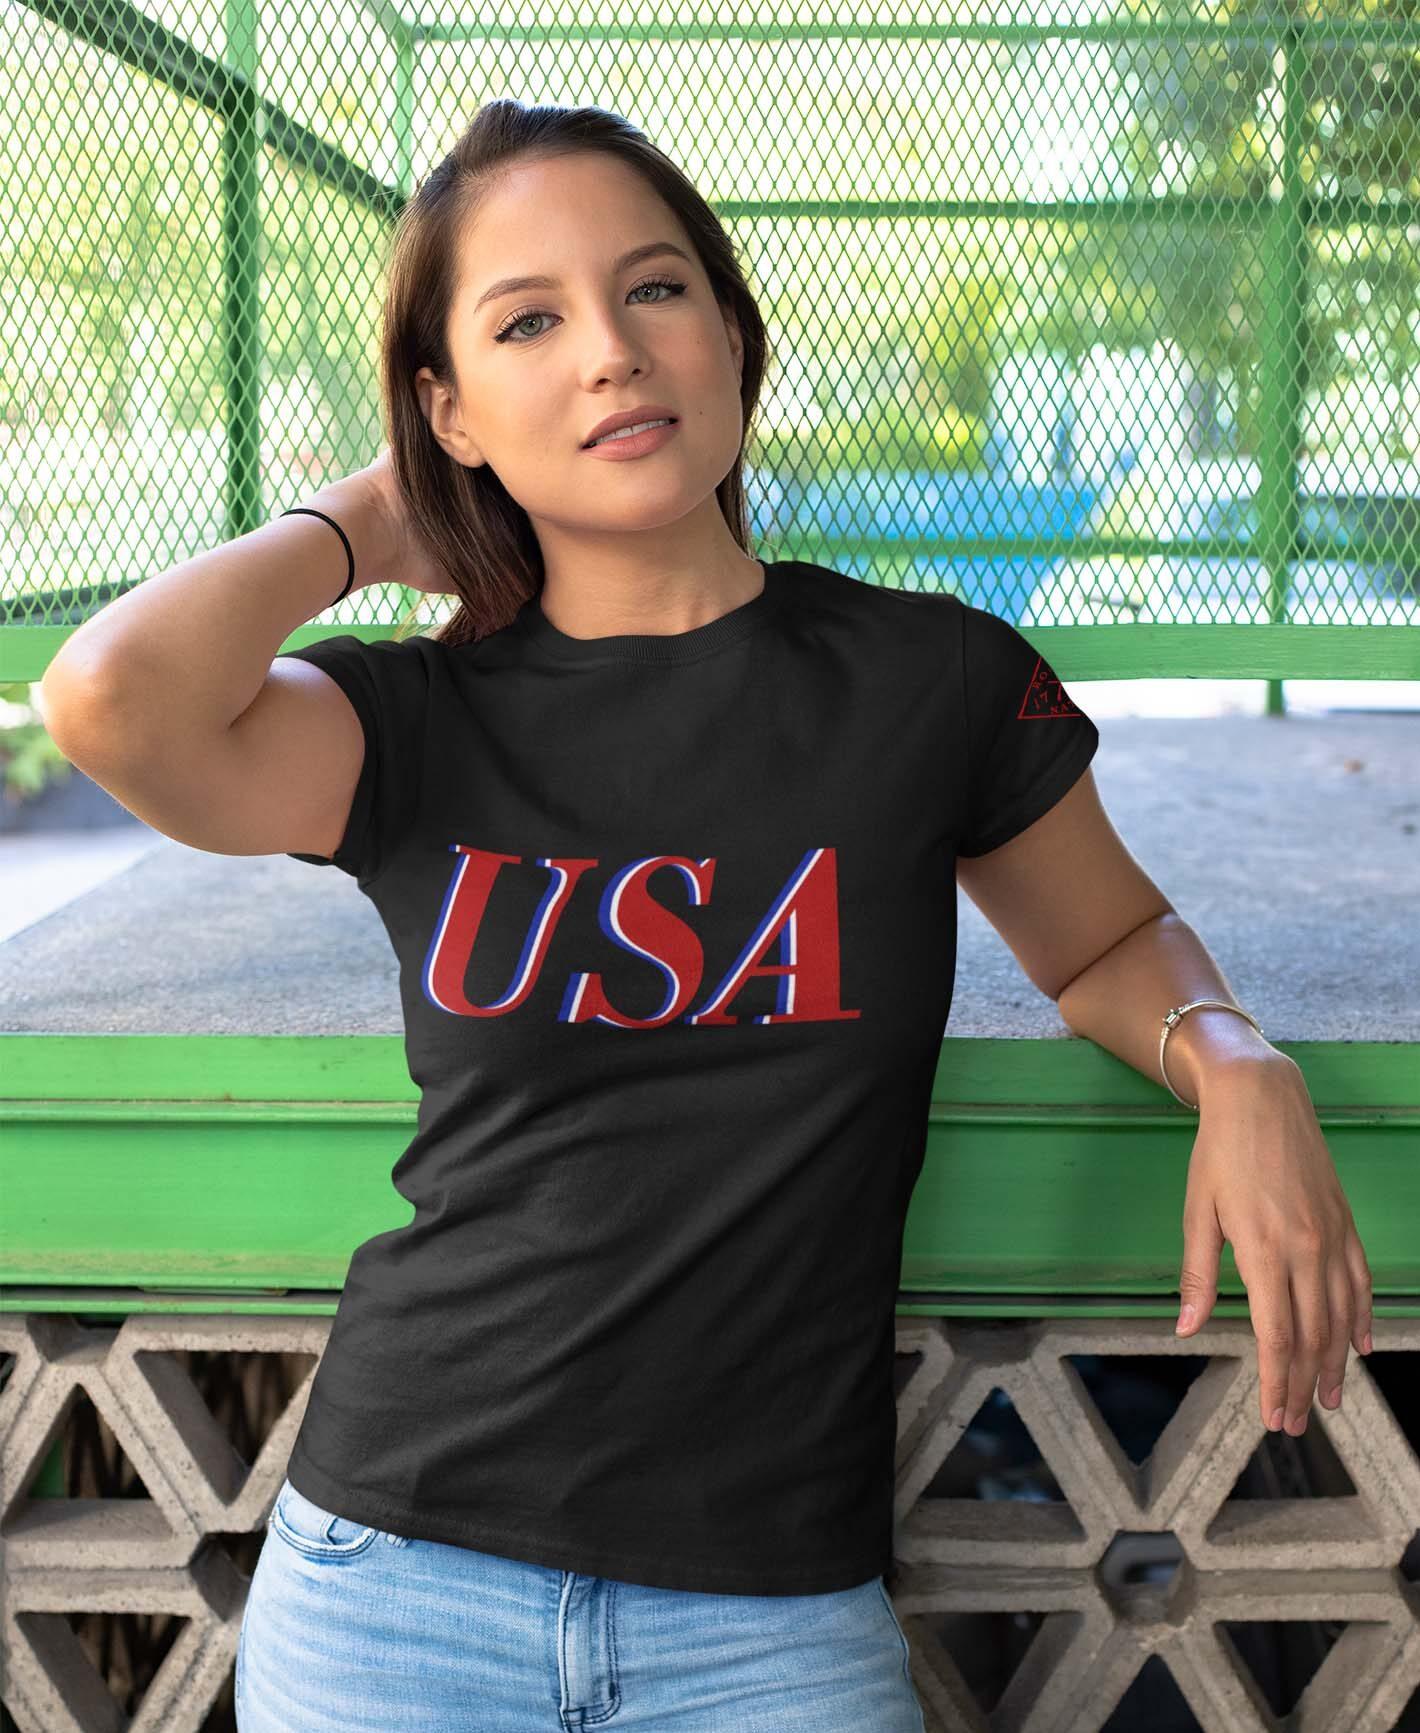 USA Red White & Blue on Women's Black T-Shirt